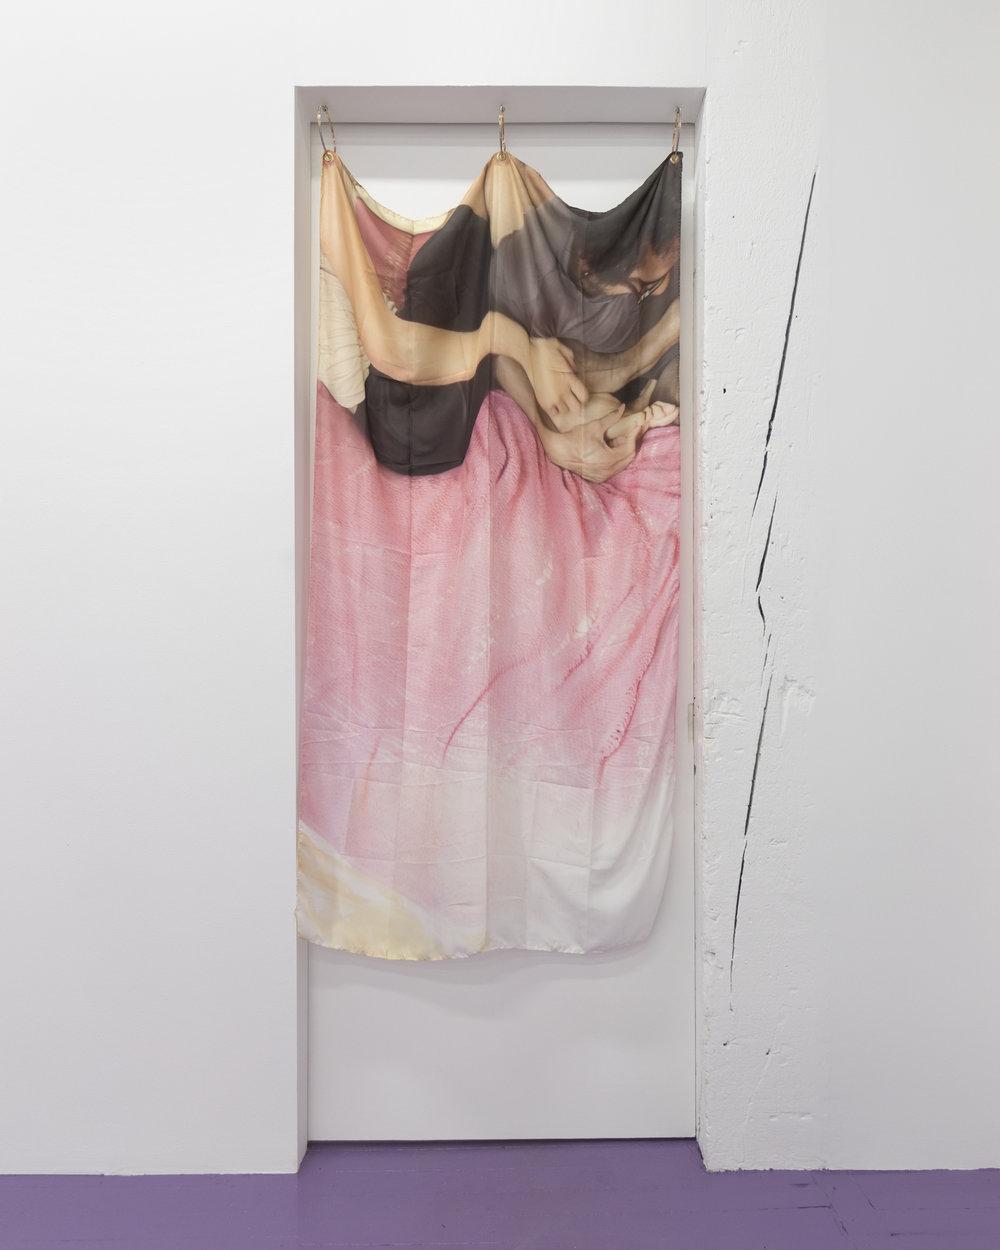 Amina Ross  2:22, Soft Still, Joelle&Zac , 2018 Digital print on silk, grommets, lipstick, and earrings